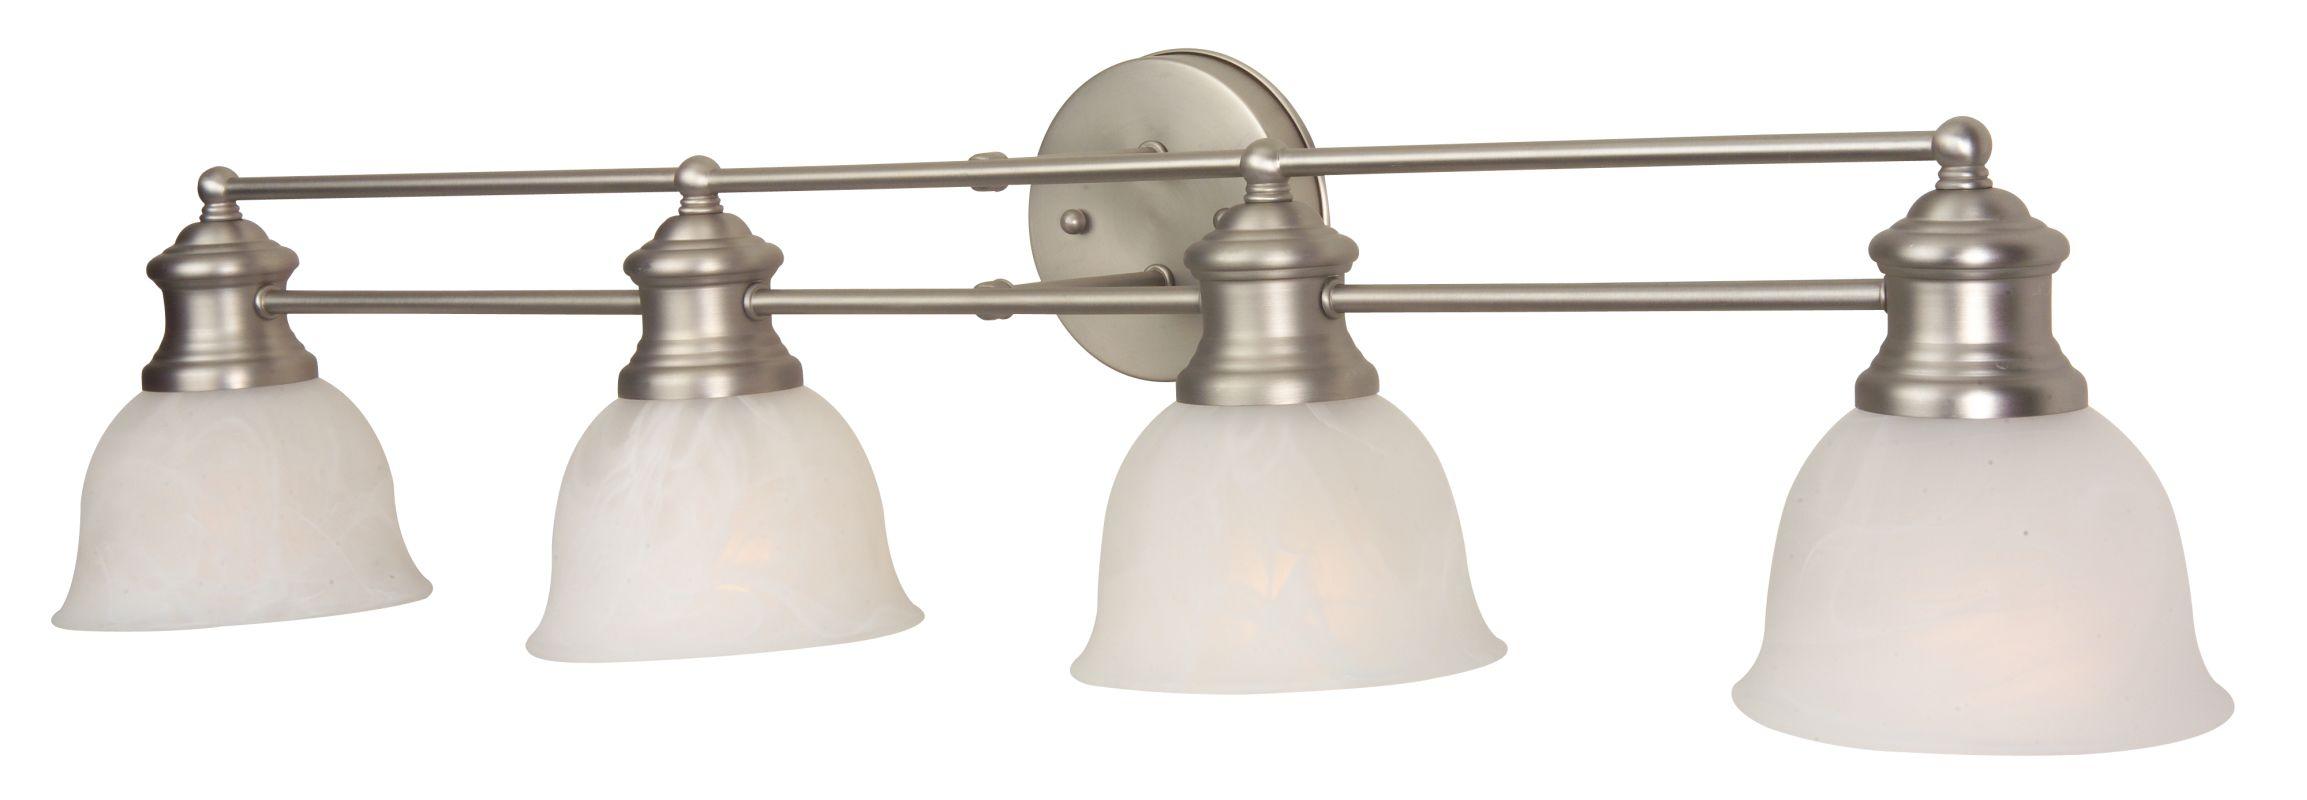 "Craftmade 19832-4 Lite Rail 35"" Wide 4 Light Bathroom Vanity Light"